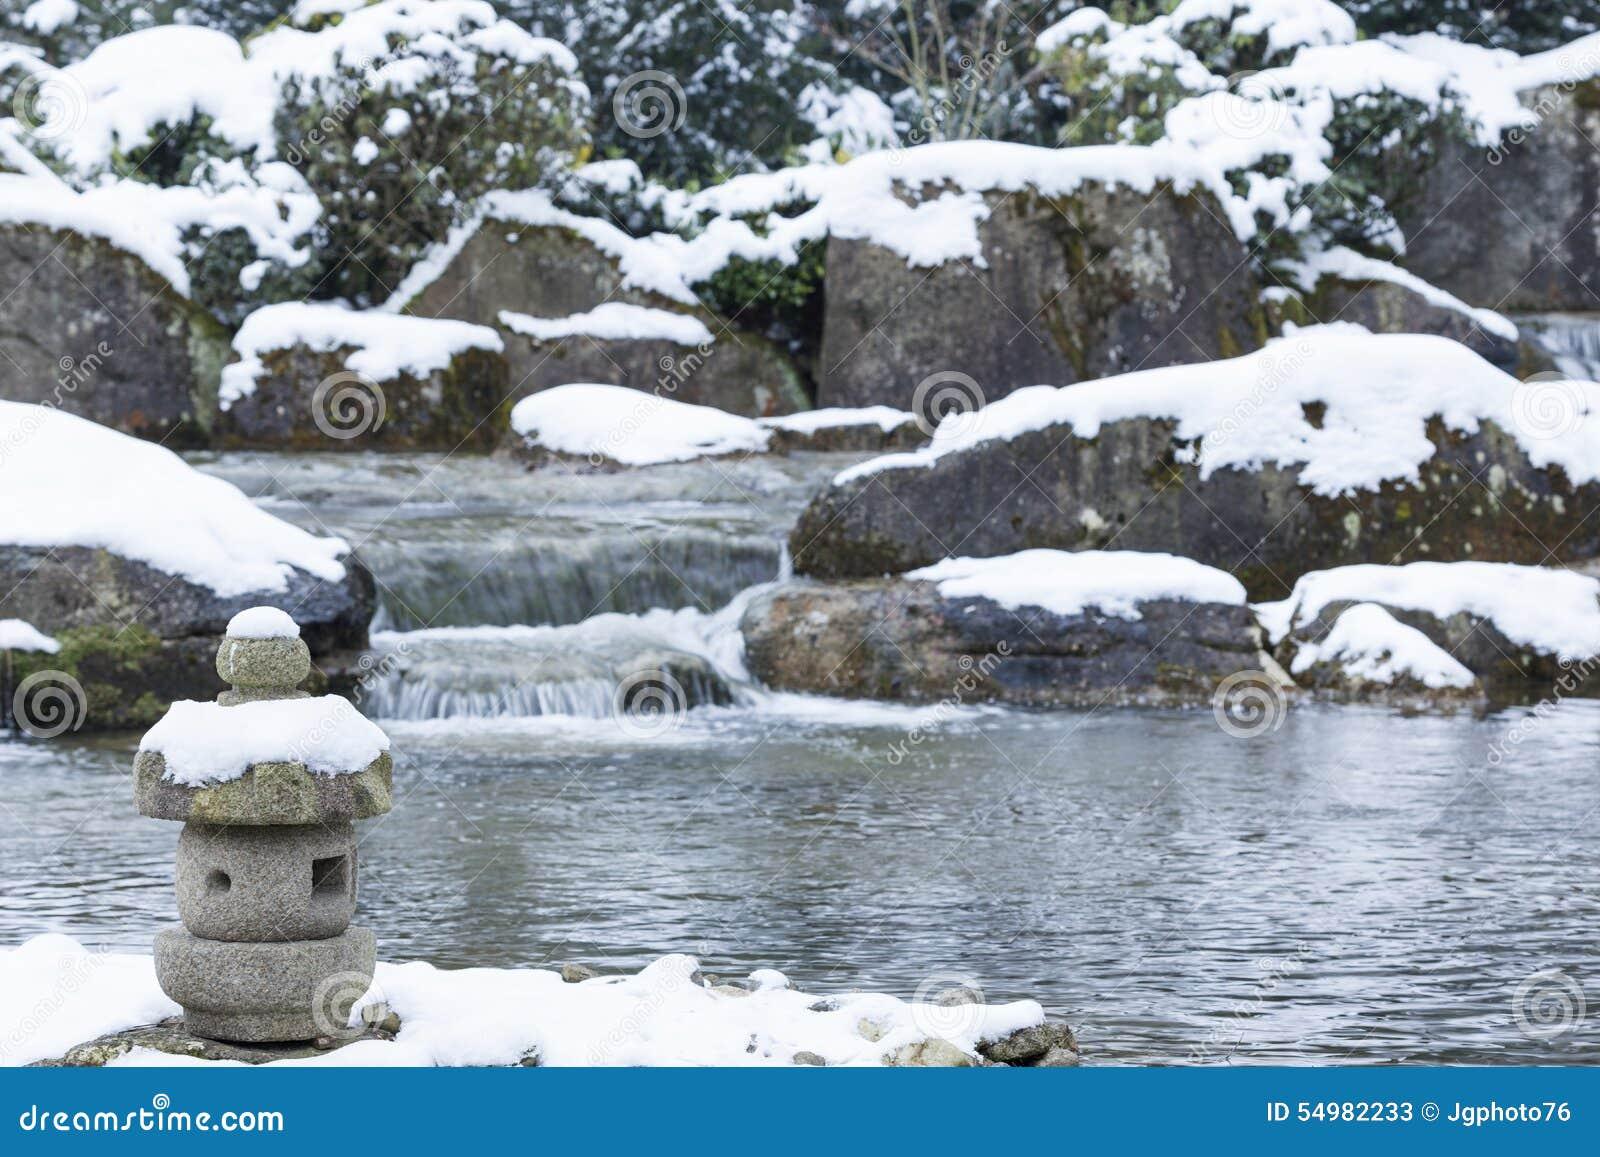 japanese lantern in japan garden stock photo image 54982233